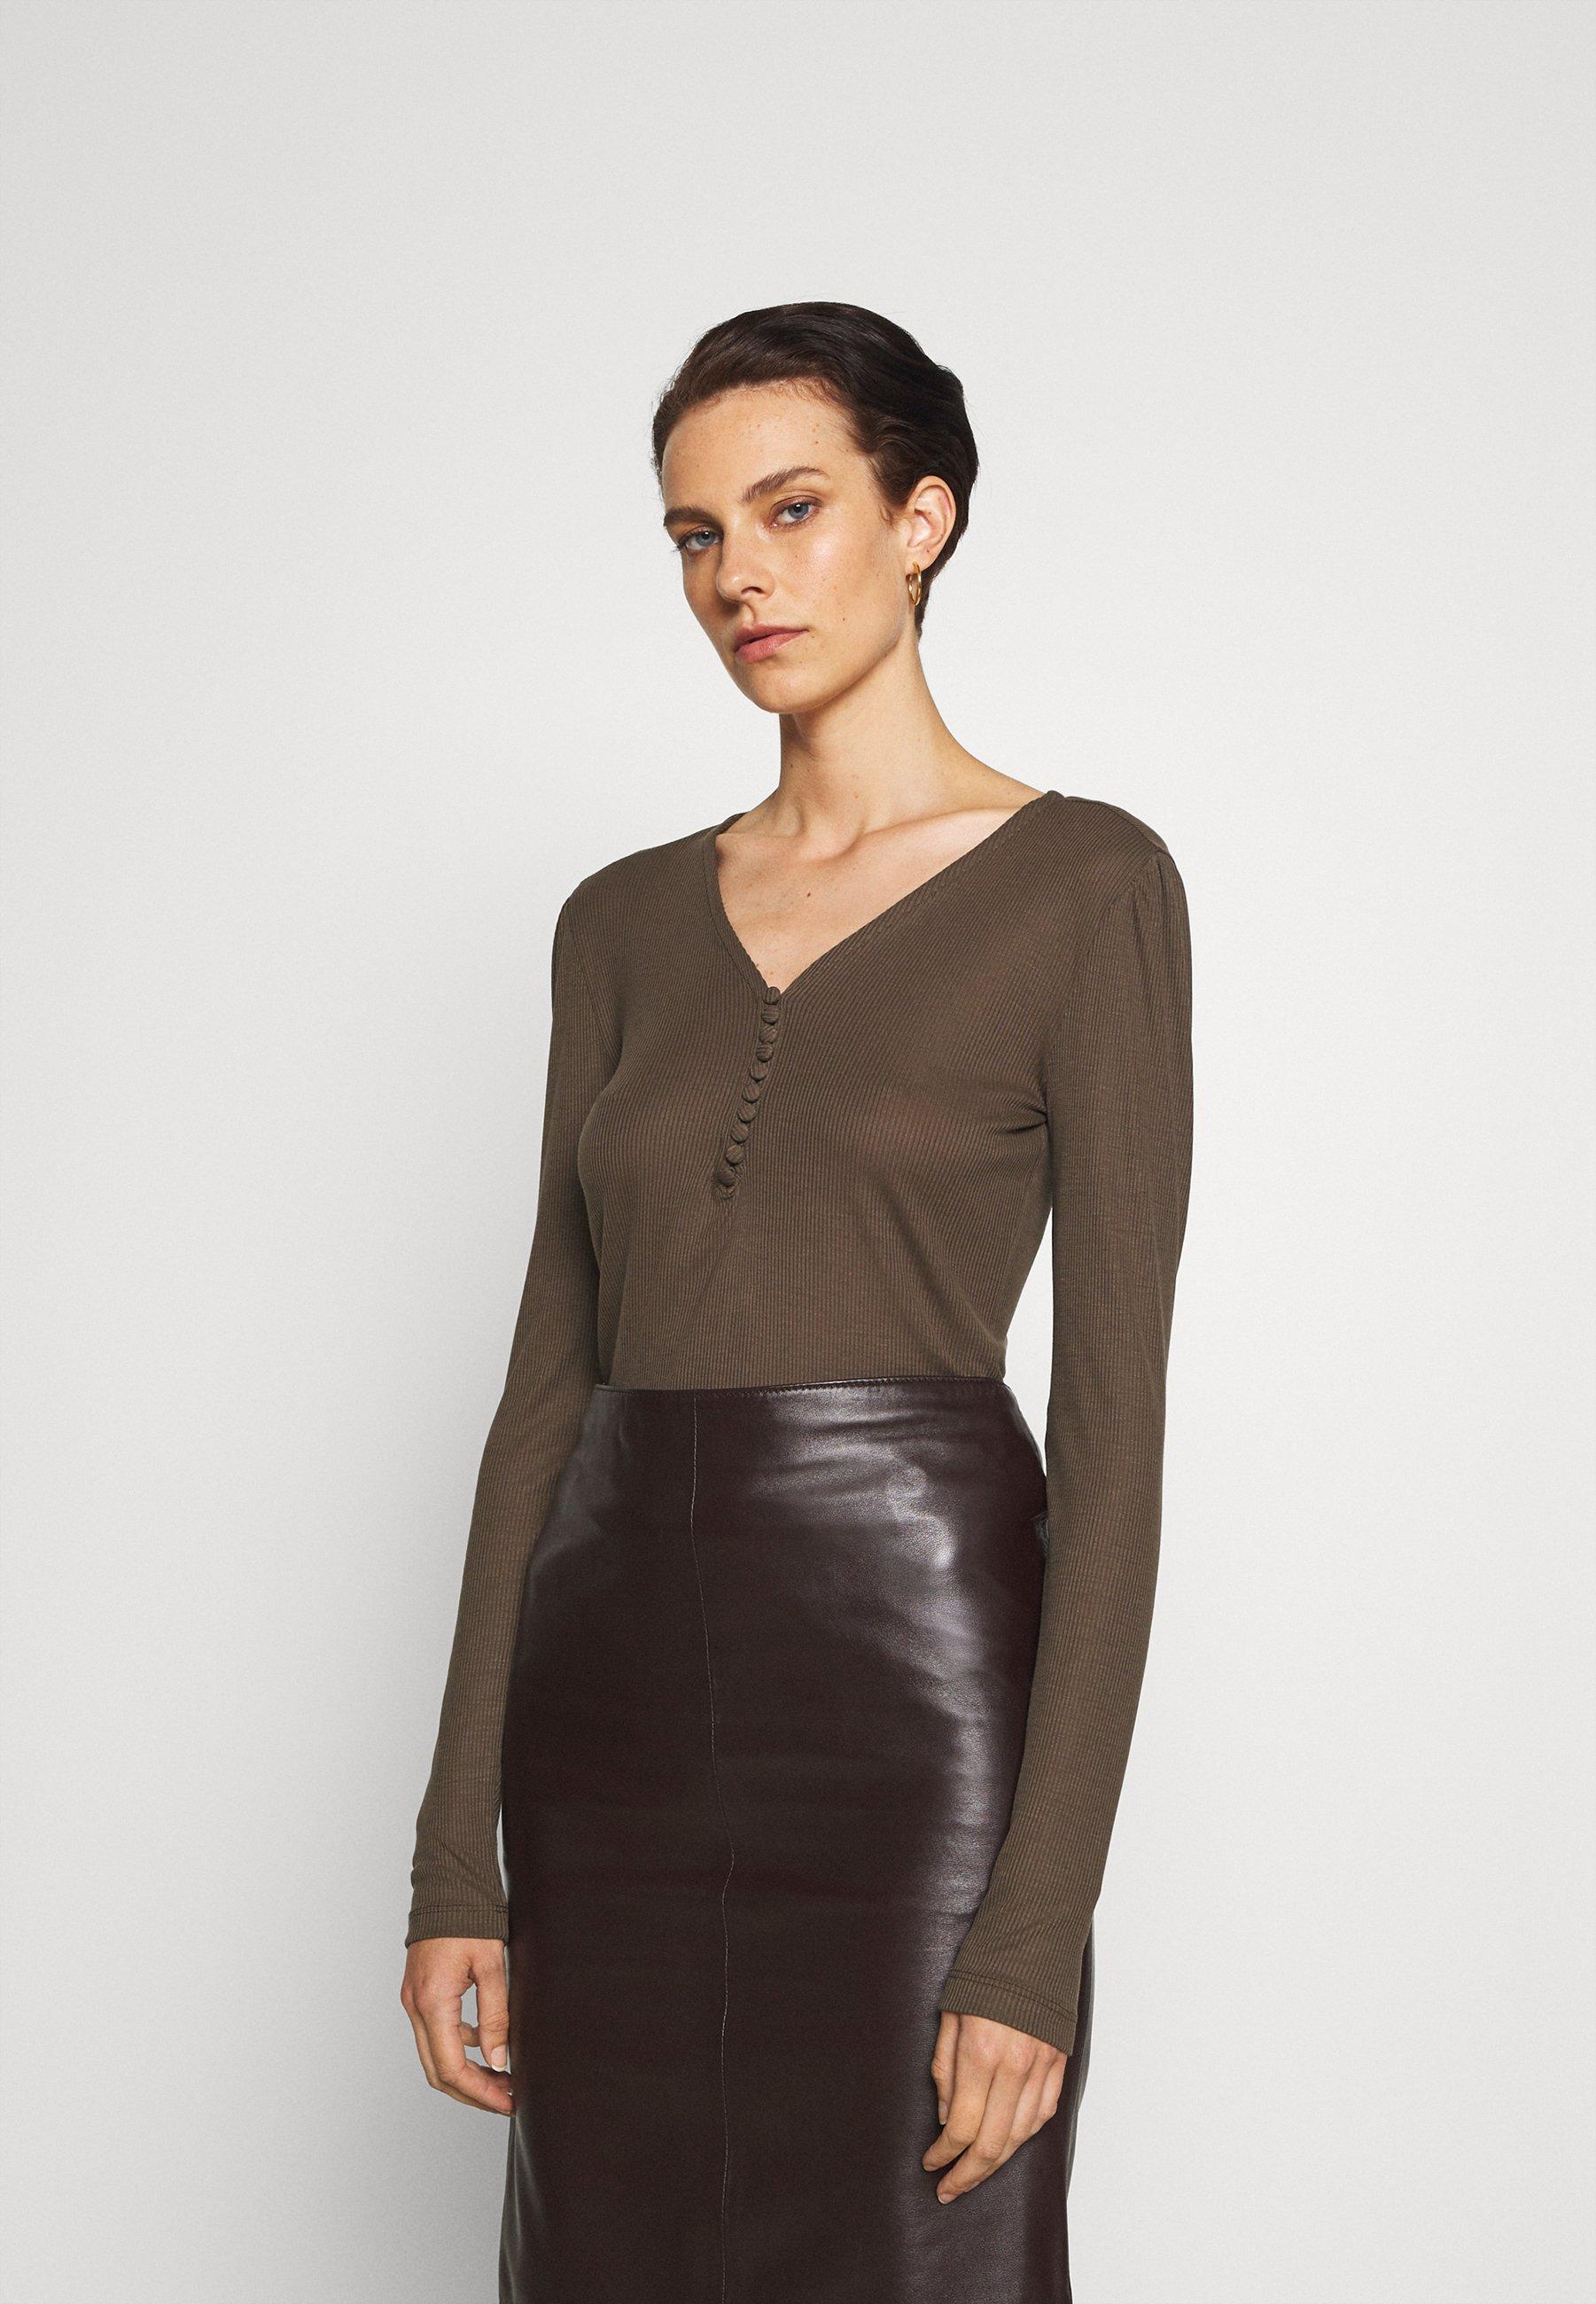 Women KATKA JUBI - Long sleeved top